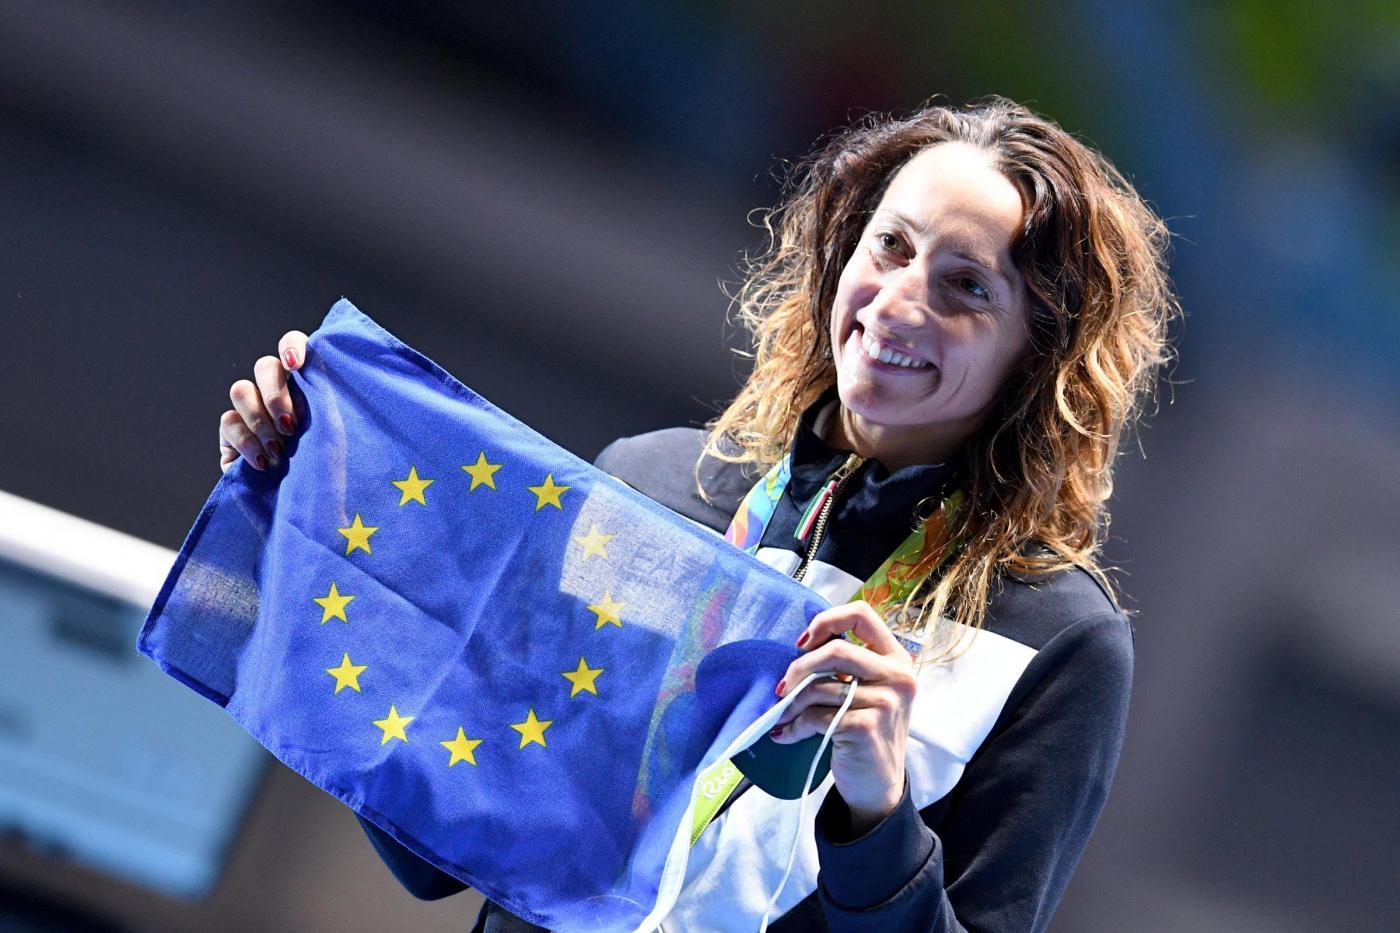 Olimpiadi 2016: Elisa Di Francisca argento per l'Europa